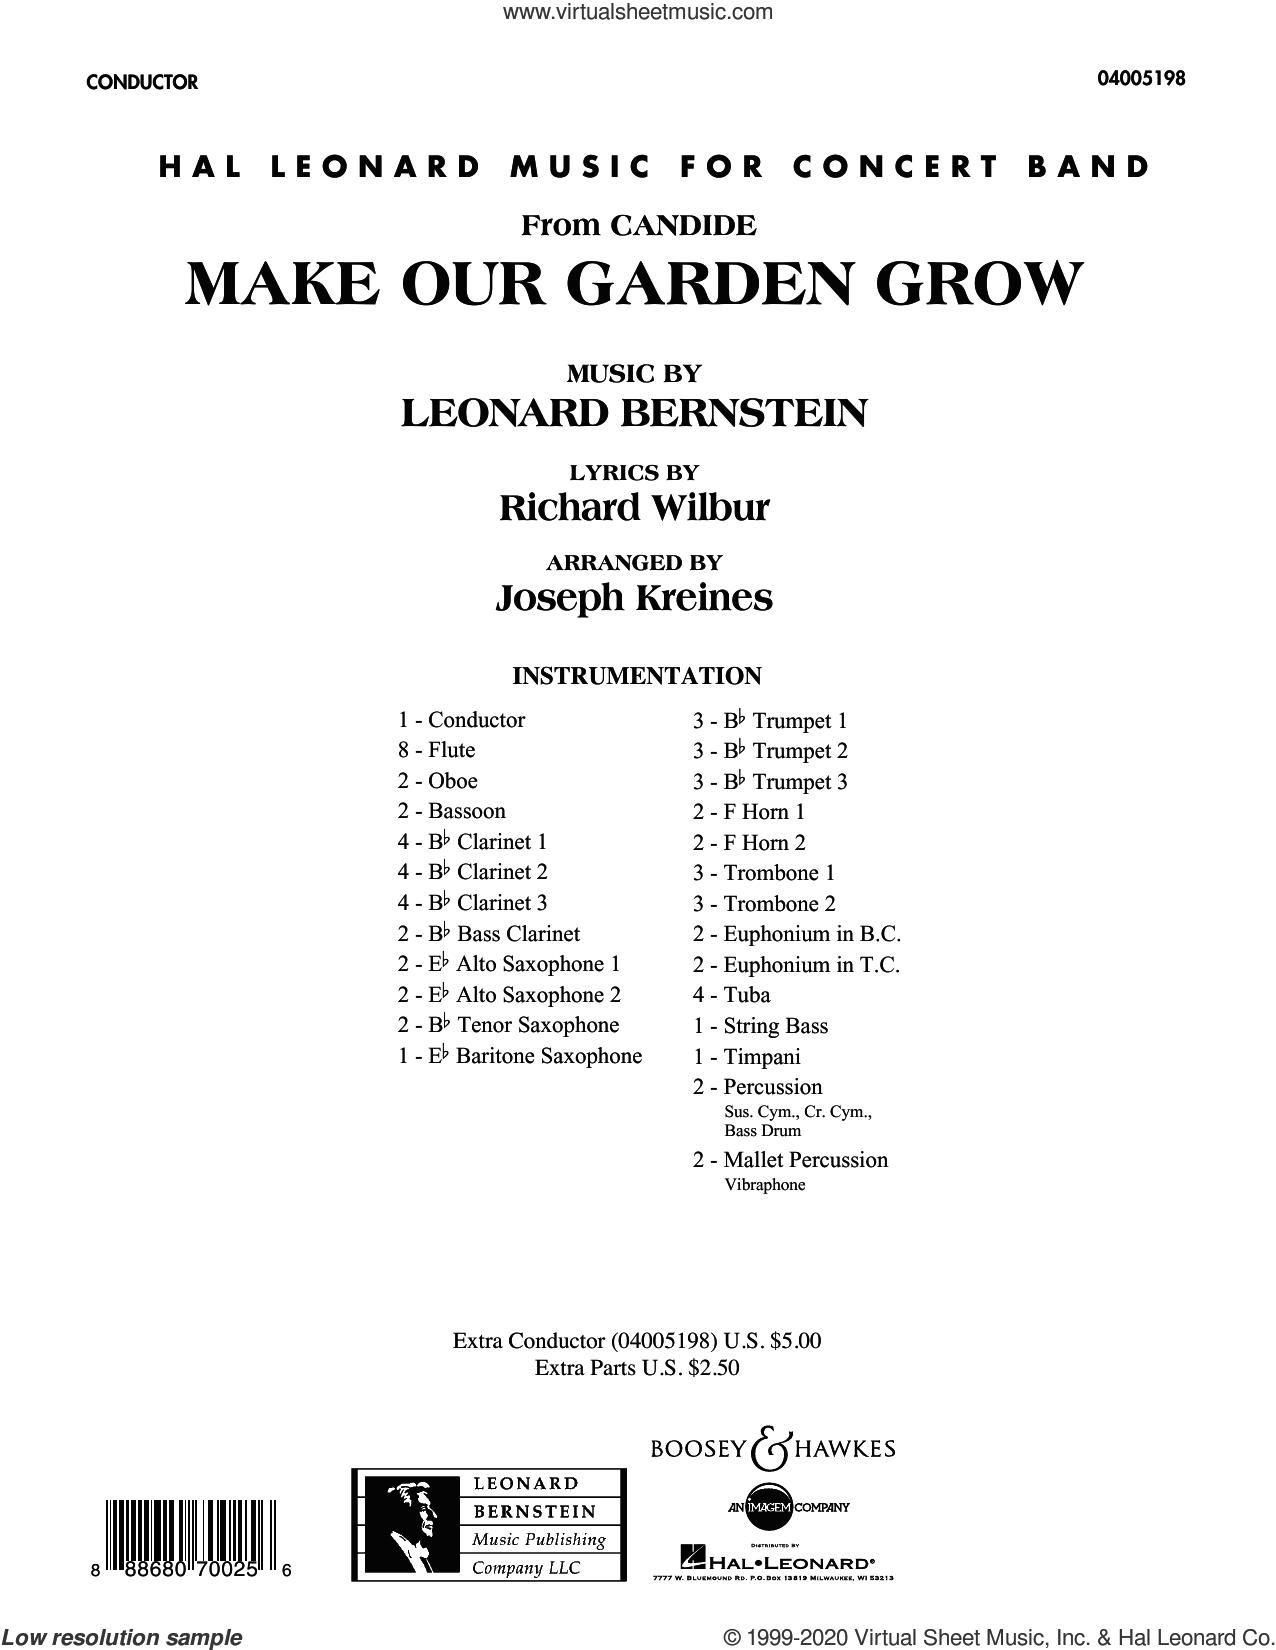 Make Our Garden Grow (from Candide) (COMPLETE) sheet music for concert band by Joseph Kreines, Leonard Bernstein and Richard Wilbur, intermediate skill level